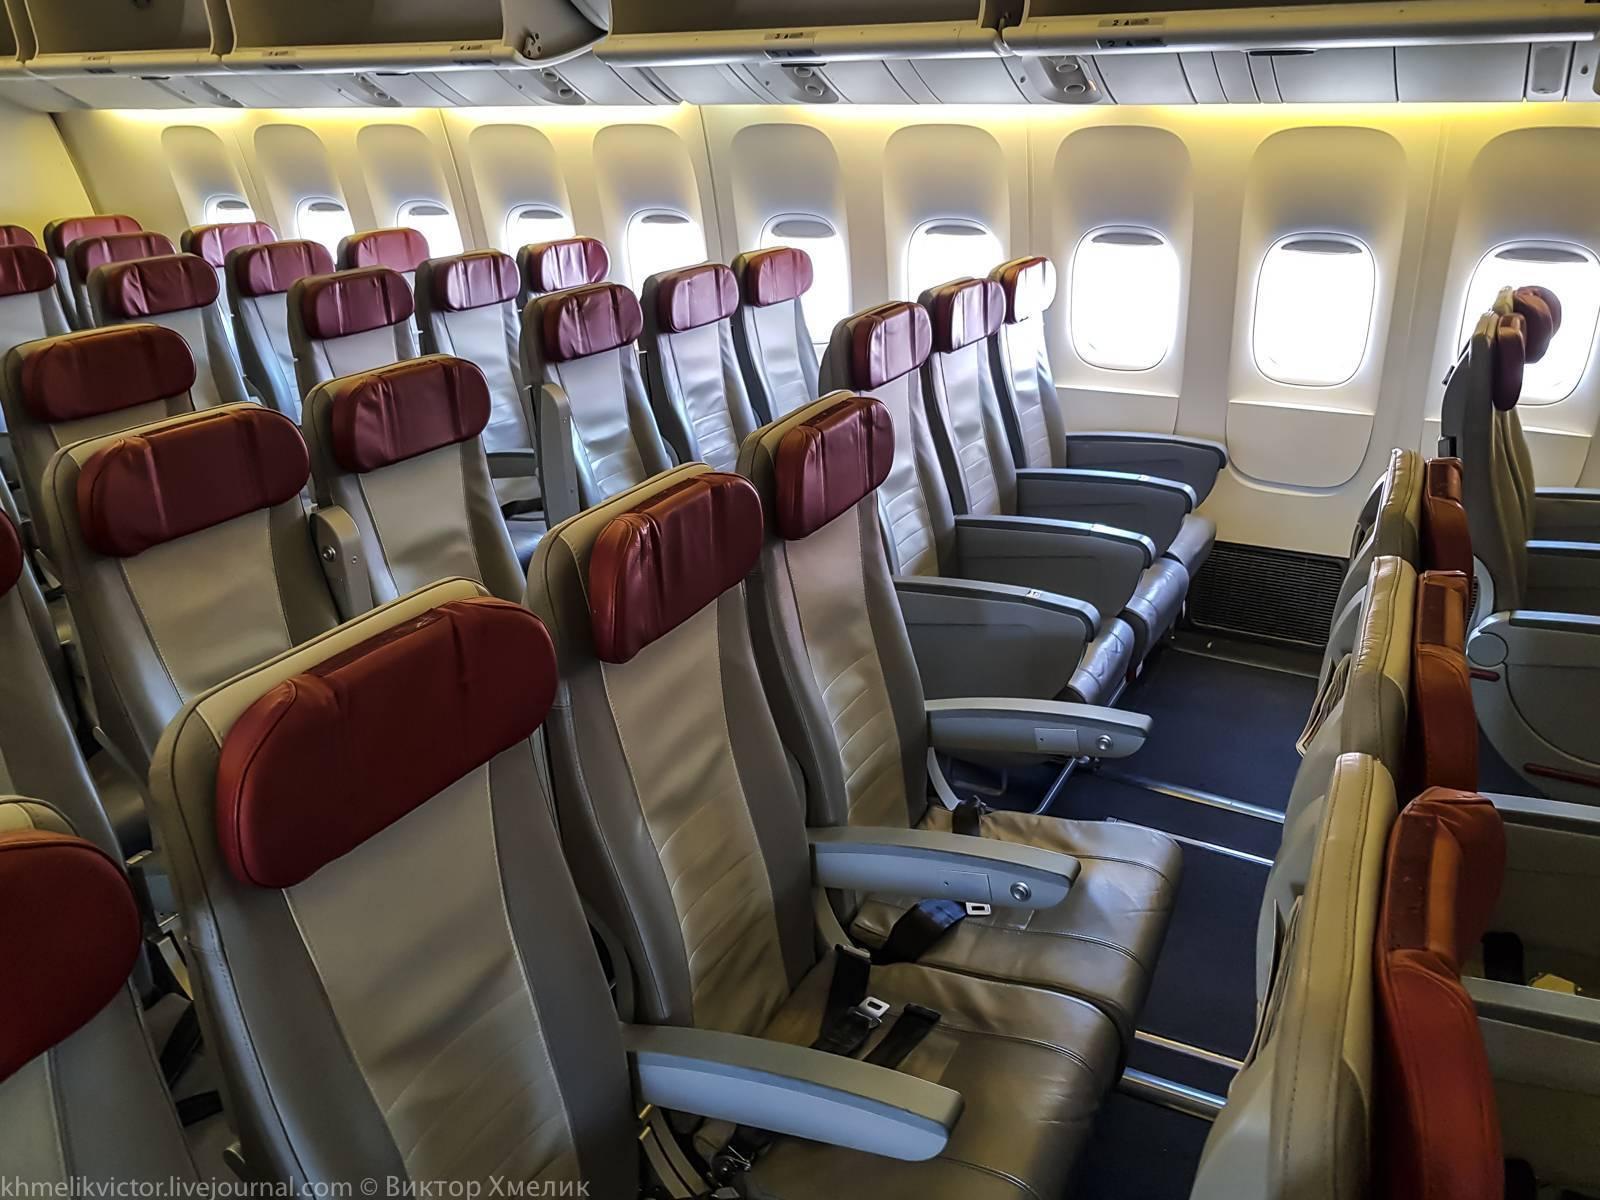 Схема boeing 777-300: лучшие места